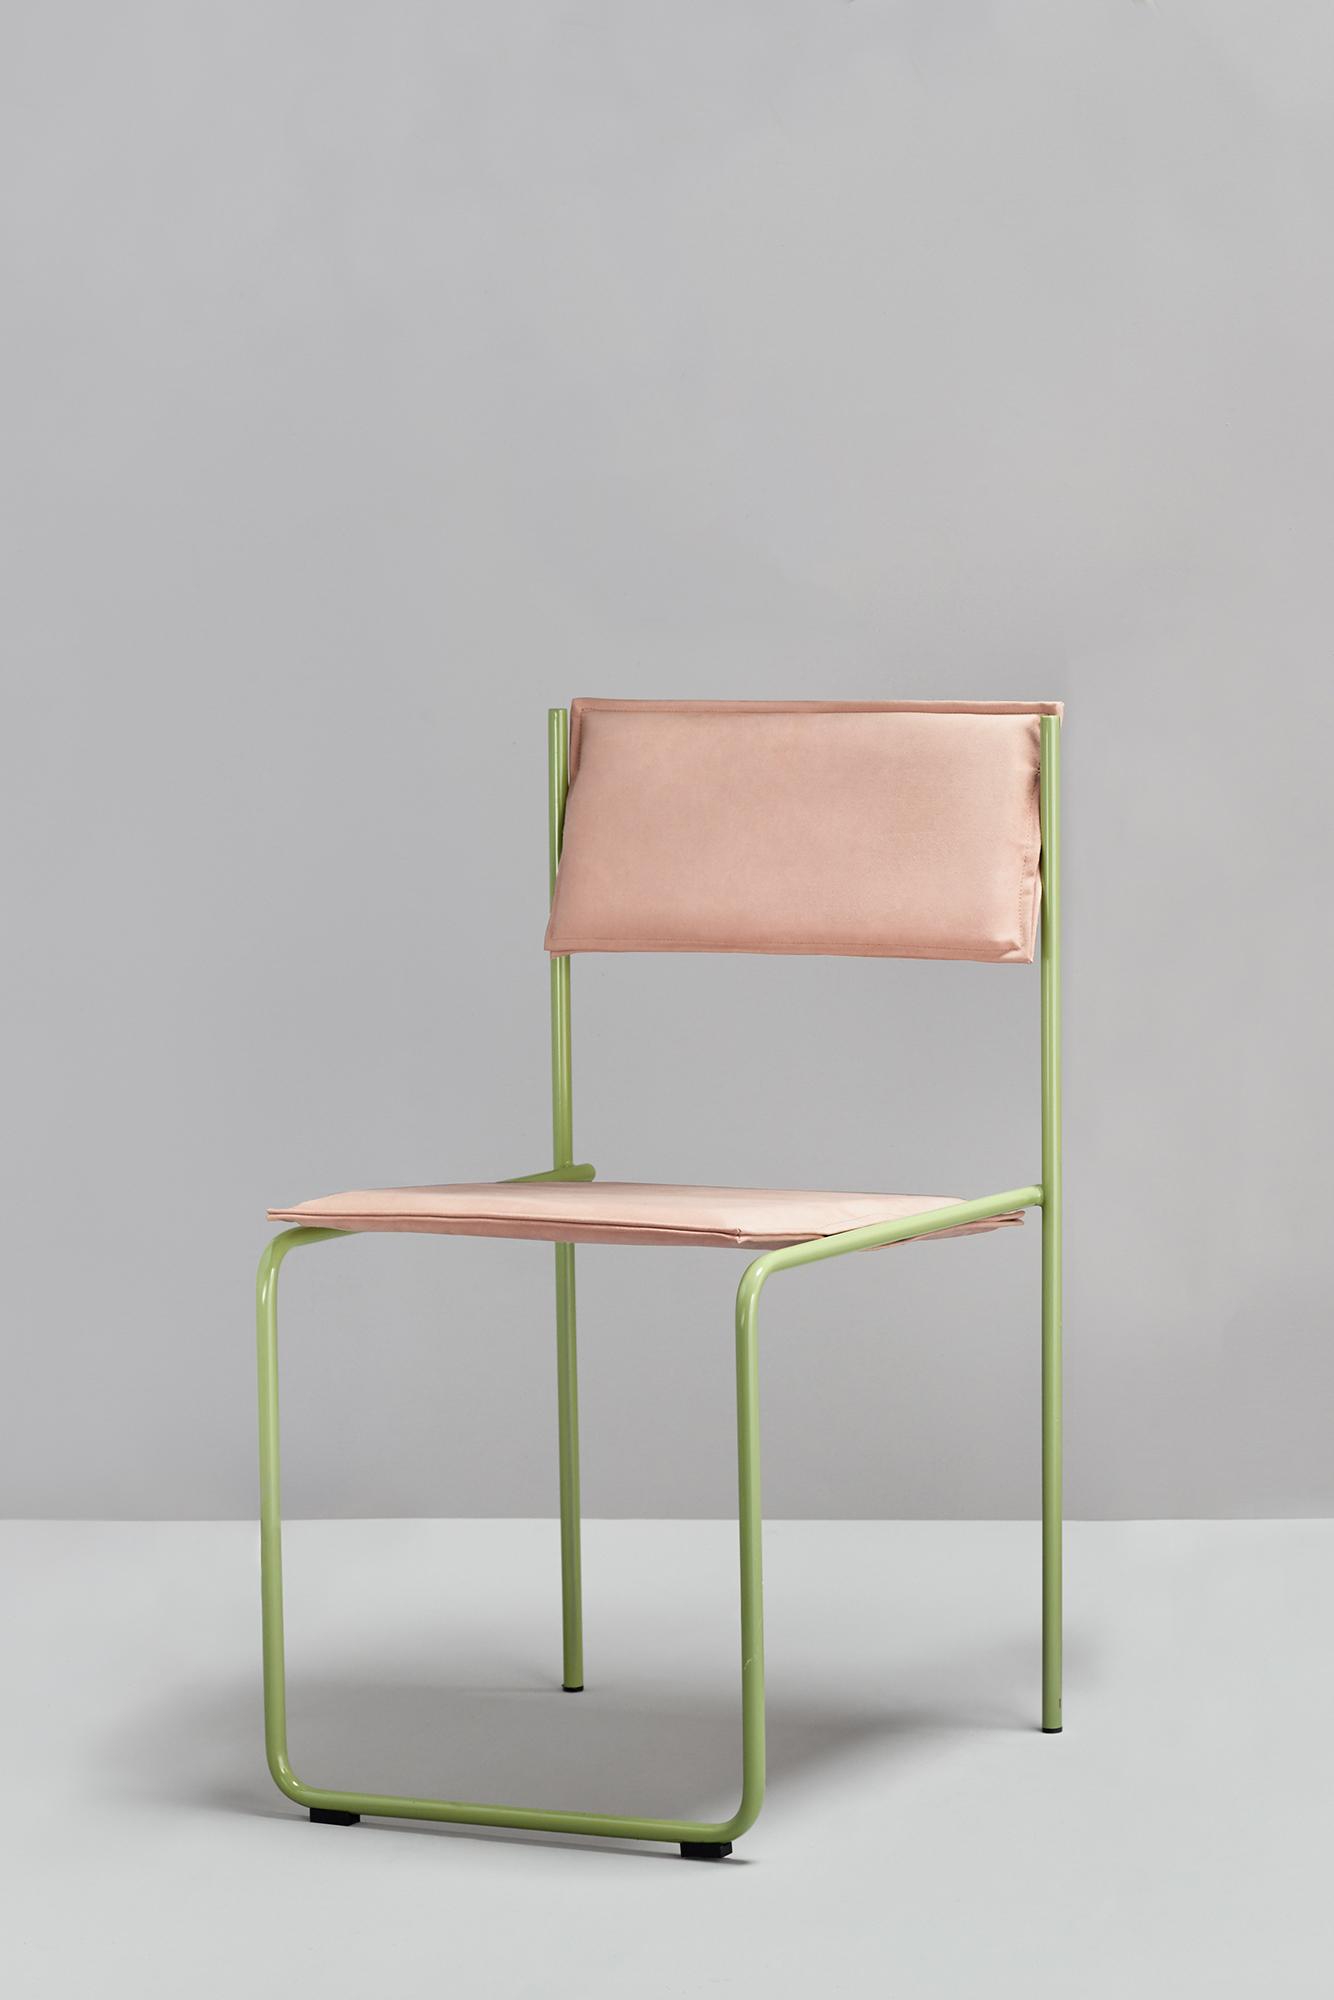 trampol n chair by cuatro cuatros for missana sohomod blog. Black Bedroom Furniture Sets. Home Design Ideas